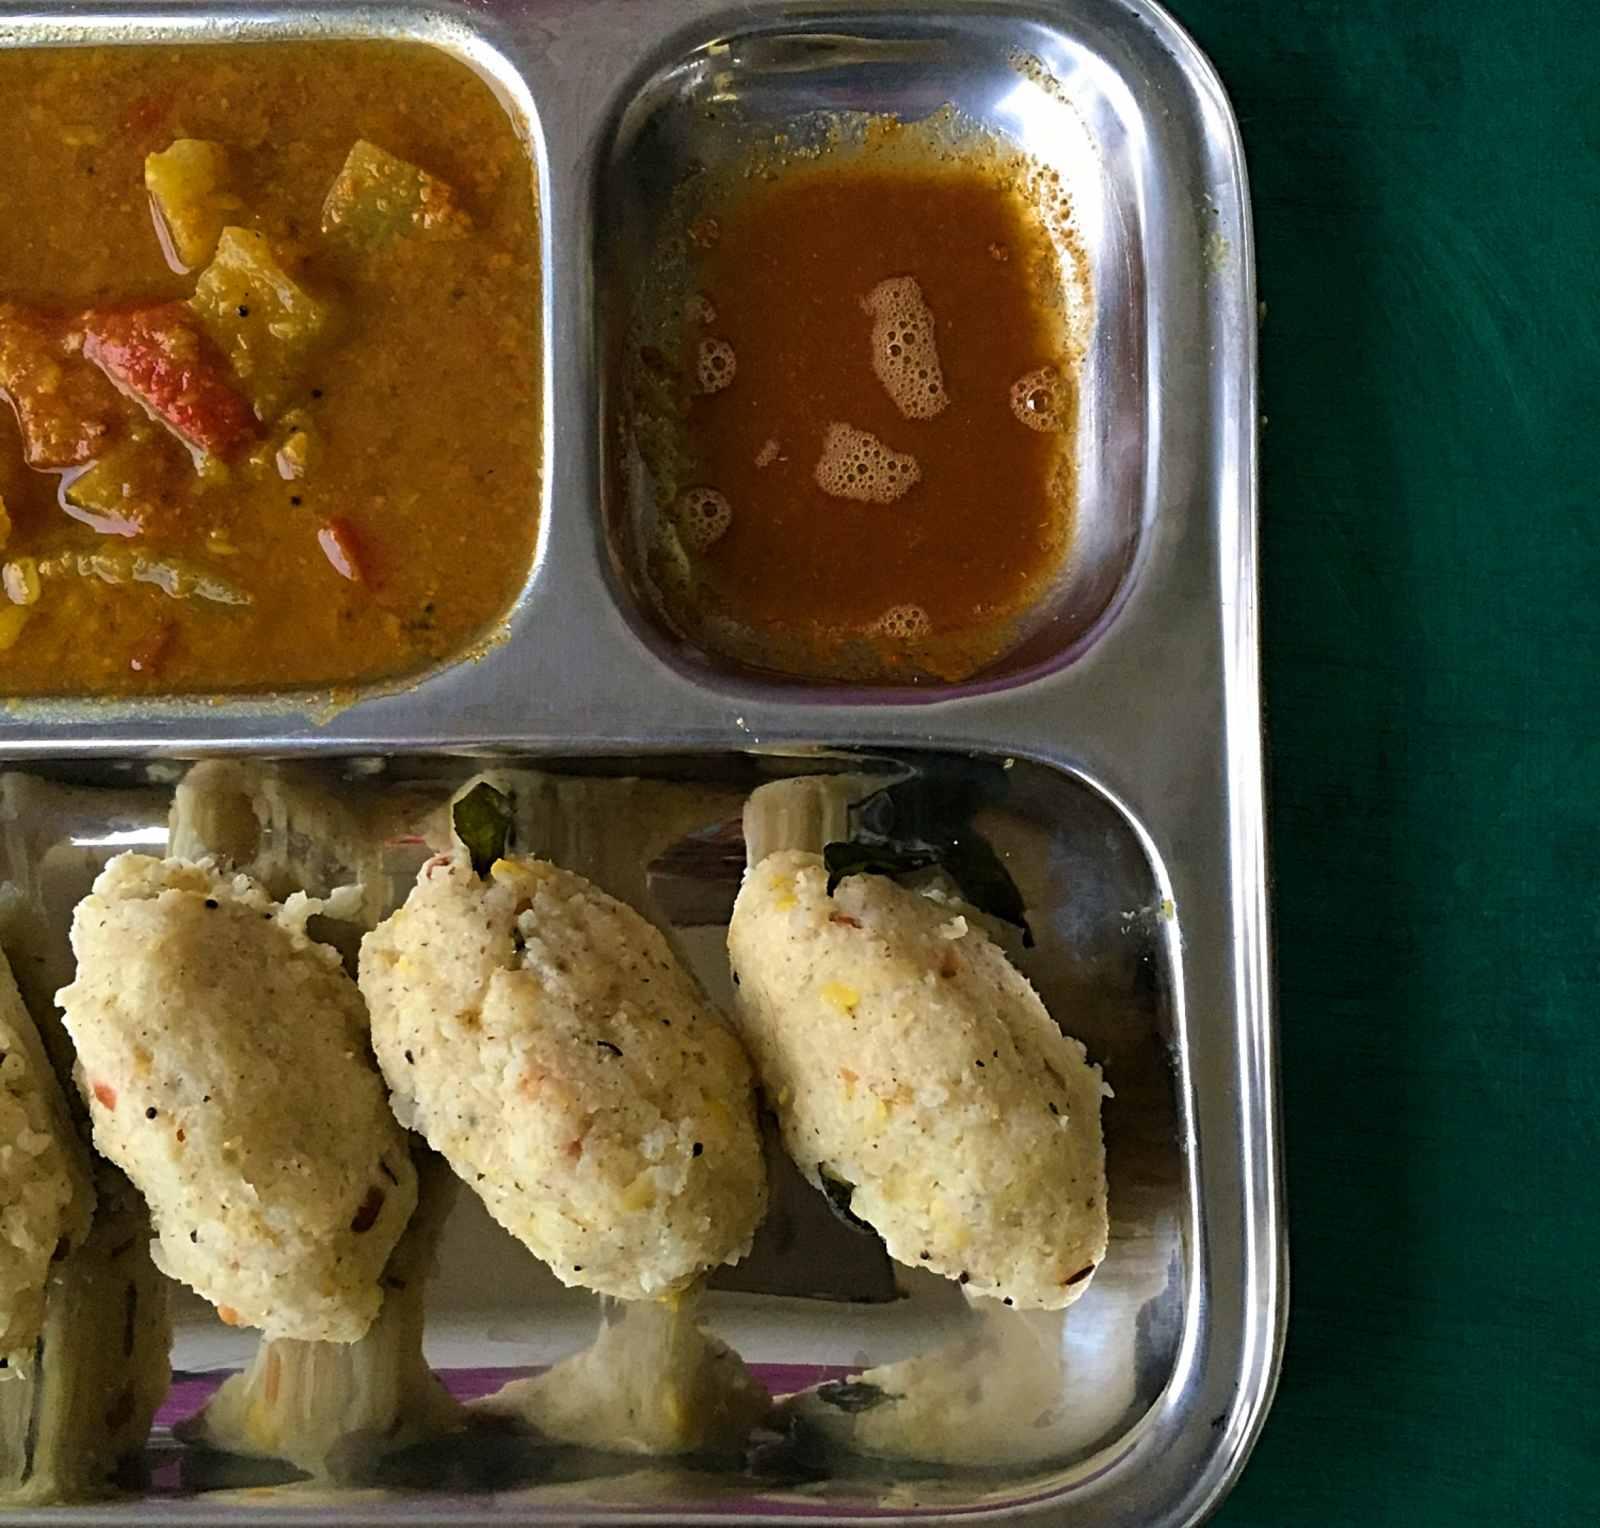 Samai arisi pidi kozhukattai tamil nadu breakfast recipe by samai arisi pidi kozhukattai tamil nadu breakfast recipe forumfinder Images